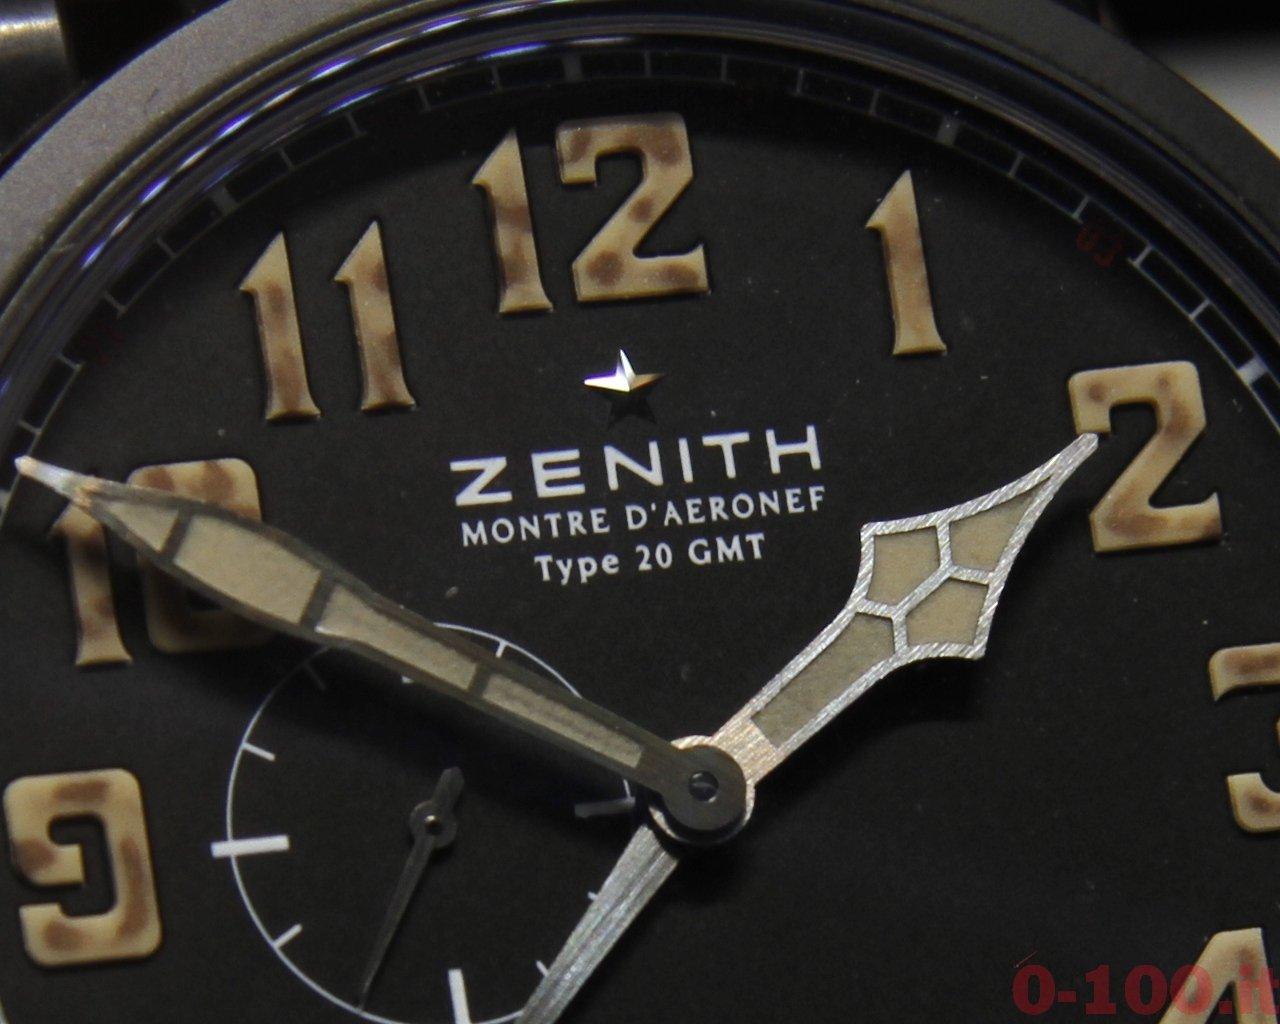 zenith-pilot-montre-daeronef-type-20-gmt-1903-baselworld-2014_10